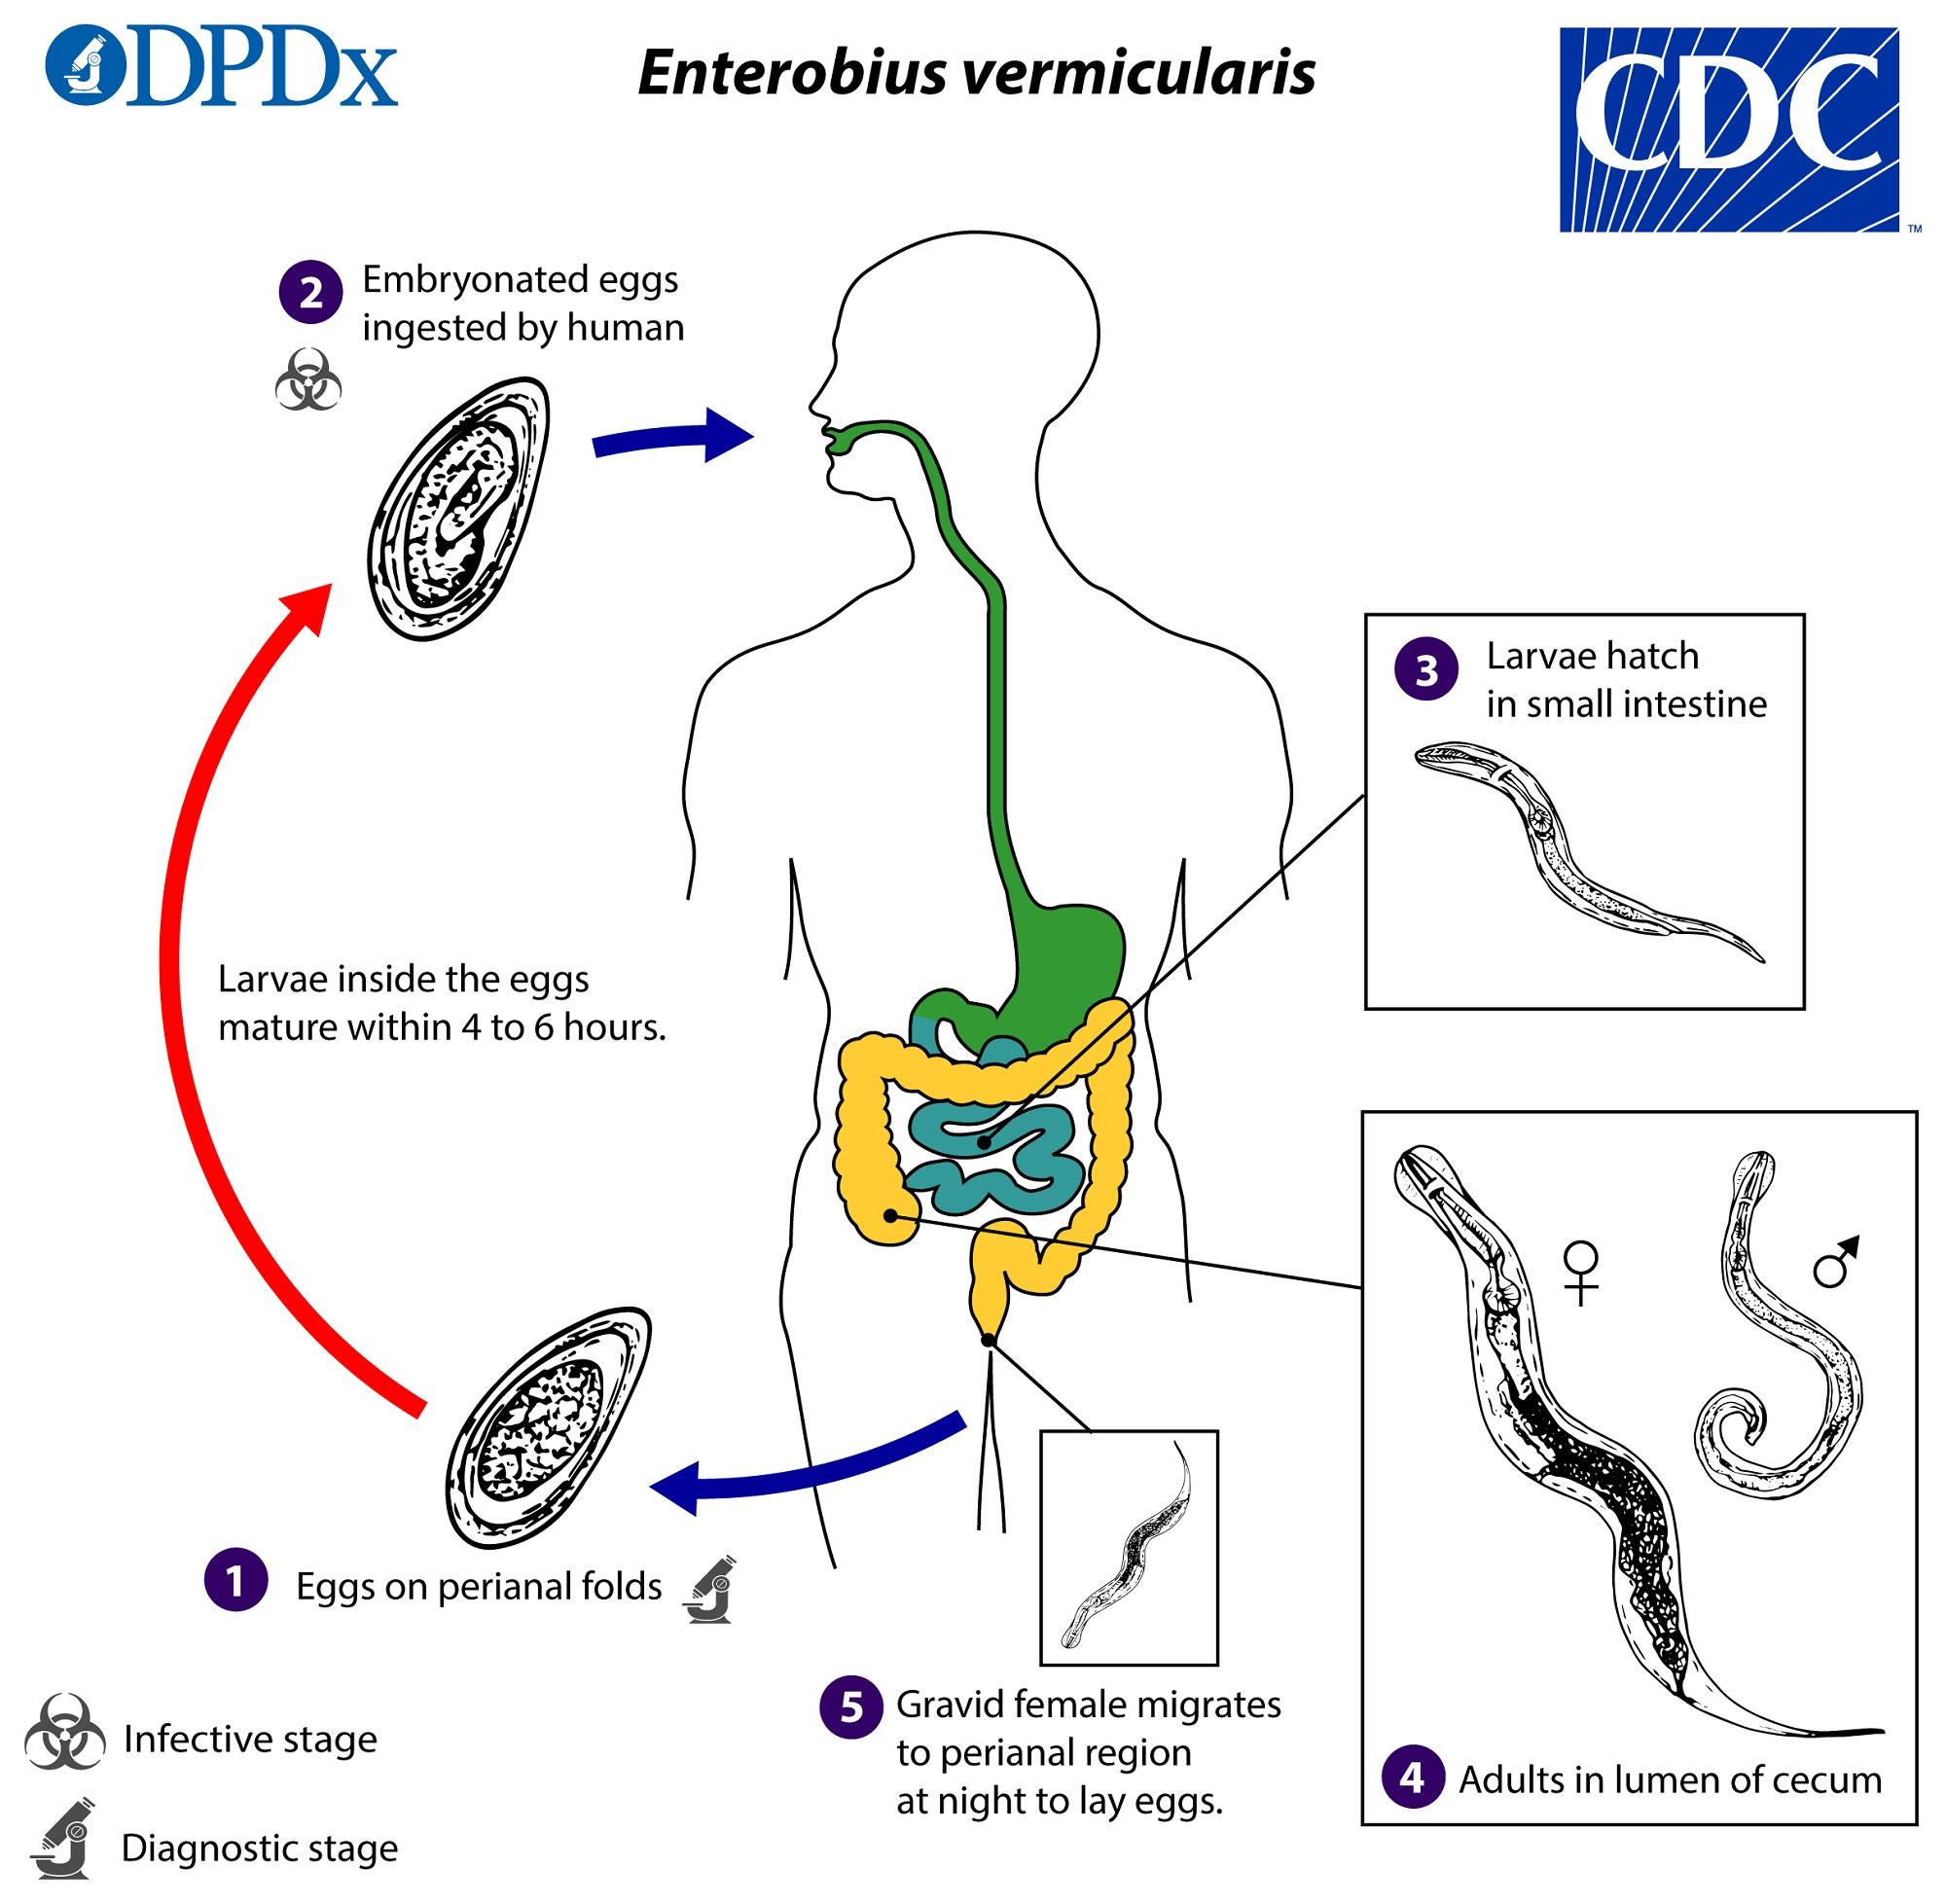 Ciclul de viață al pinworms. Enterobiasis cdc Pinworm infectarea la copii